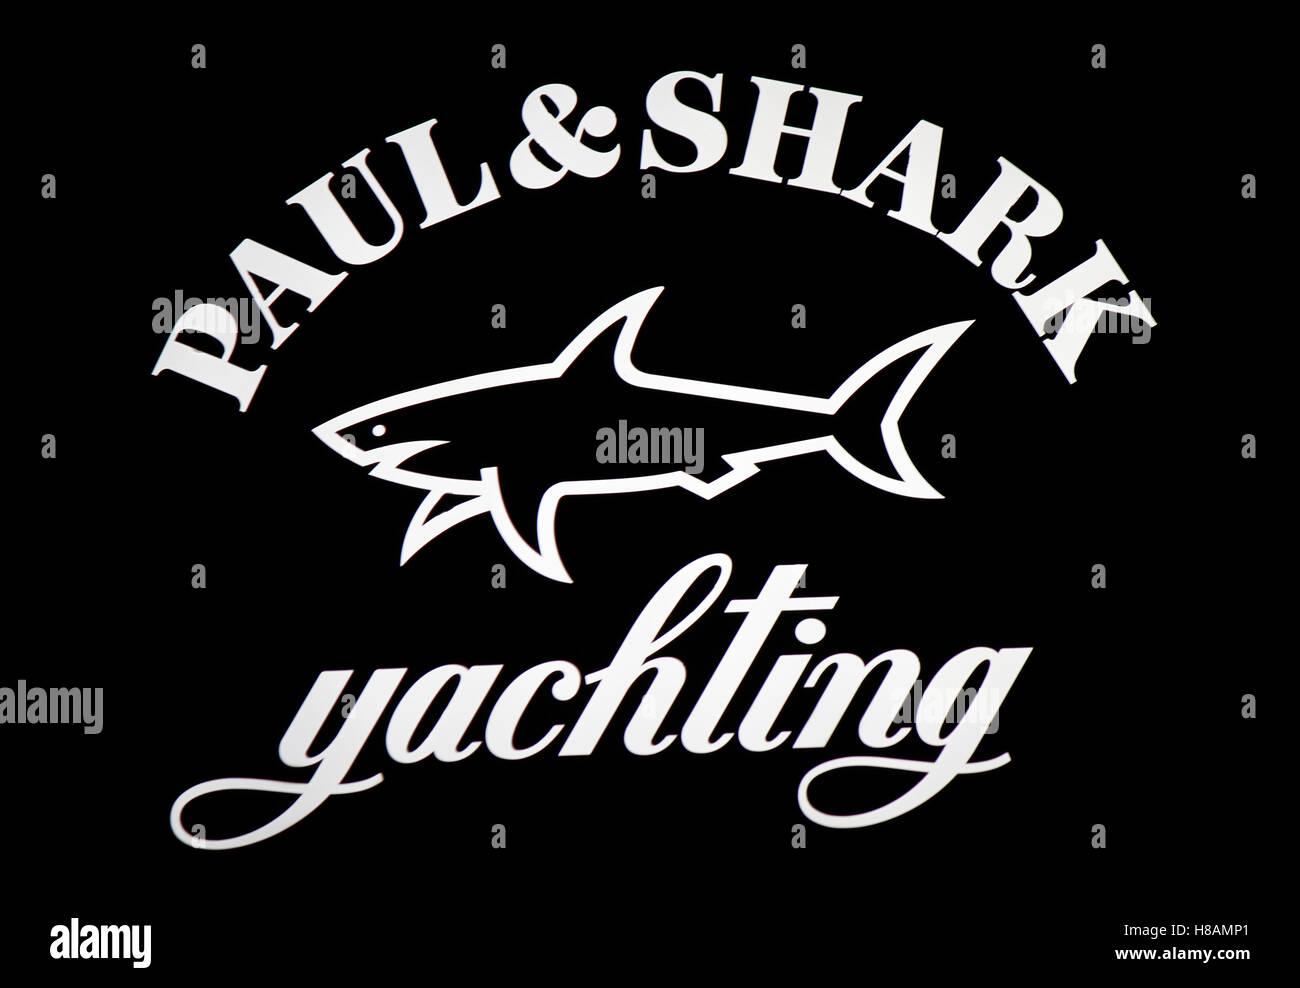 das Logo der Marke 'Paul and Shark Yachting', Berlin. - Stock Image